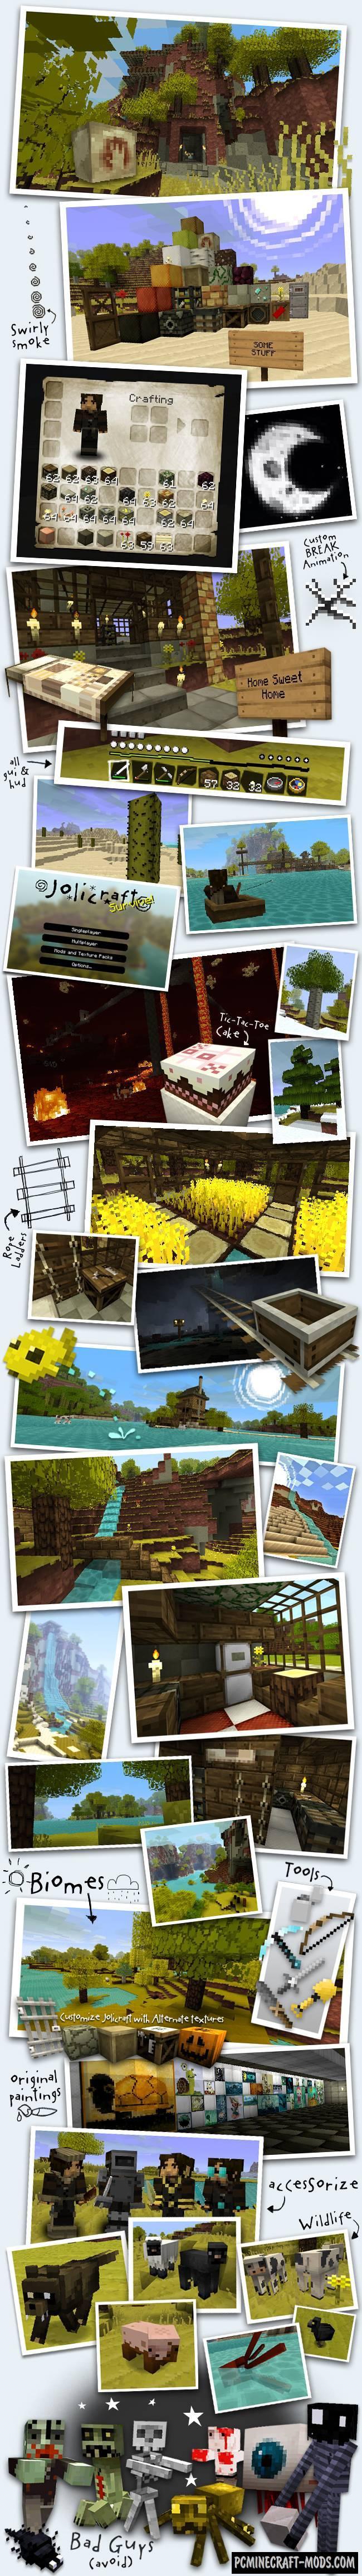 Jolicraft 16x Resource Pack For Minecraft 1.17.1, 1.16.5, 1.16.4